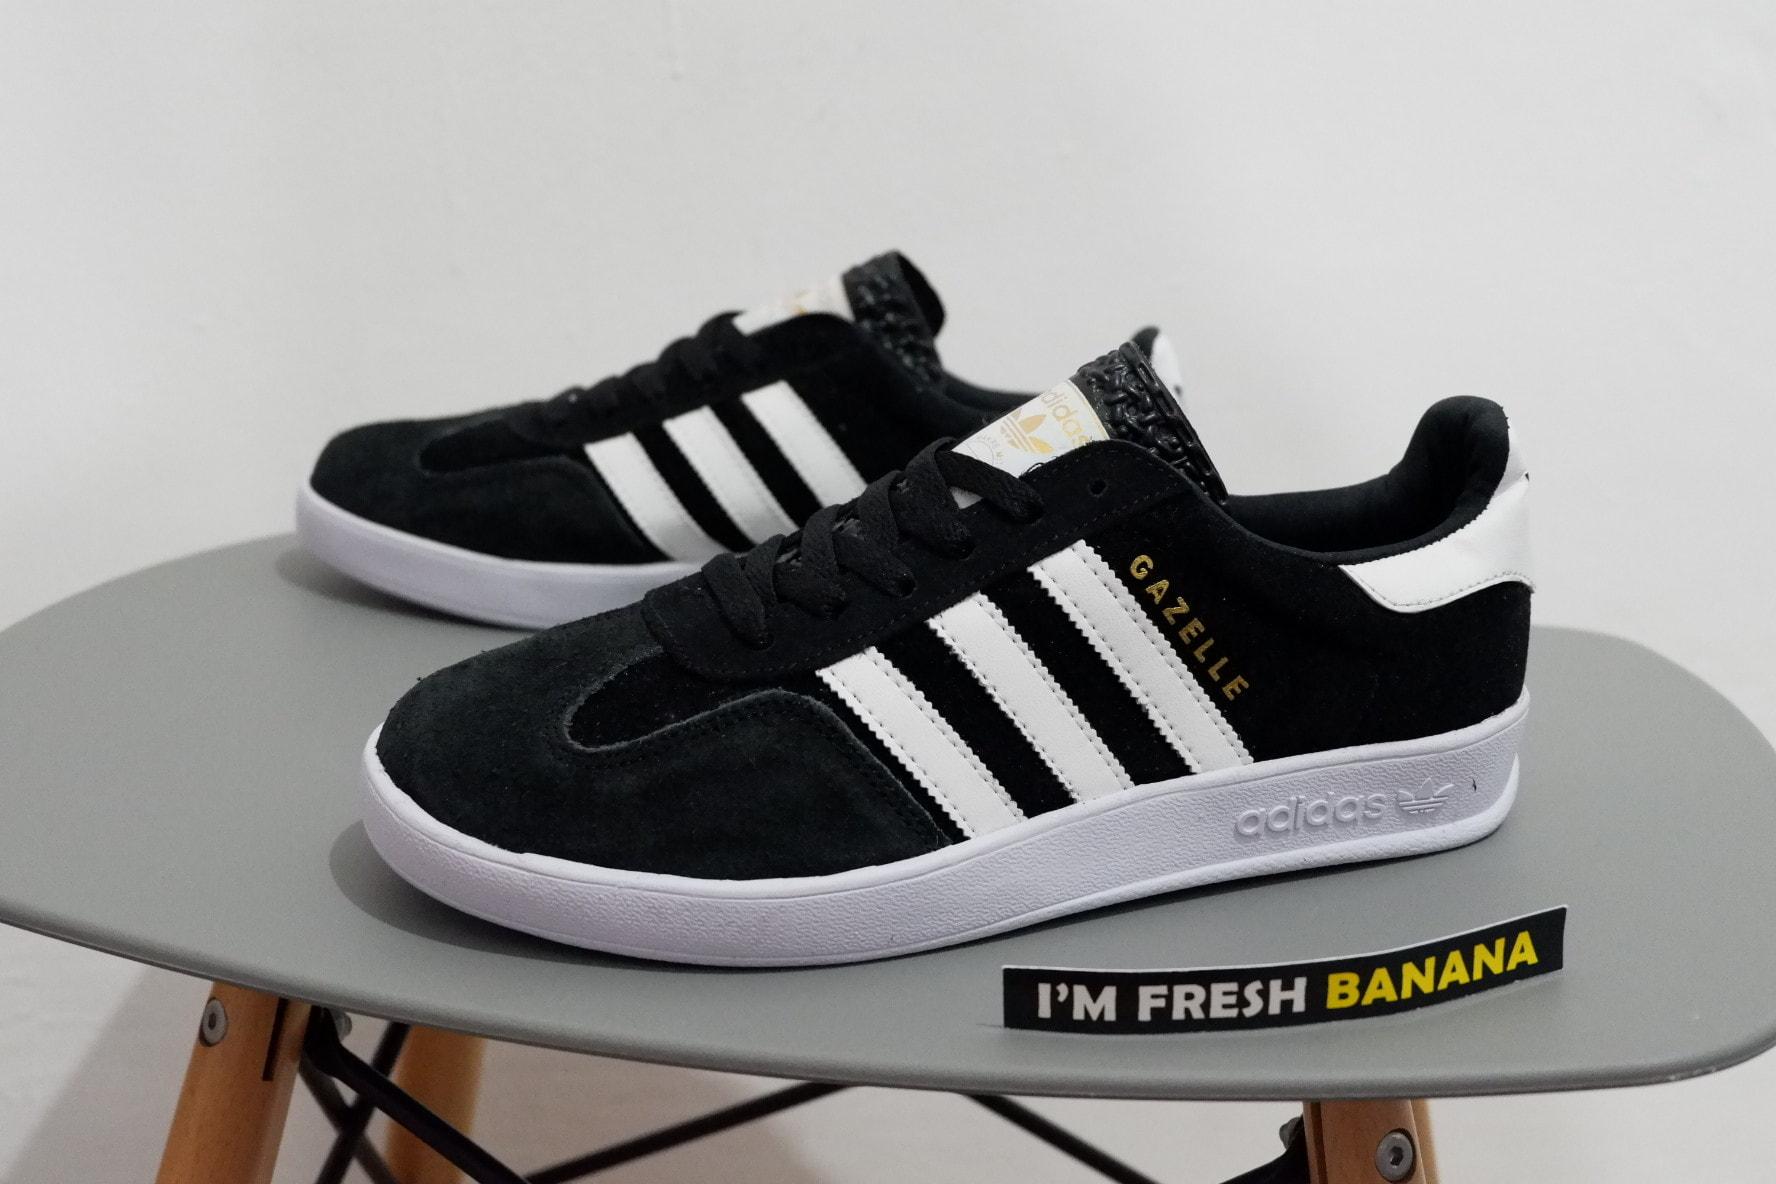 Jual Sepatu Adidas Gazelle OG Classic 2 Indoor Black White Hitam Fresh Banana